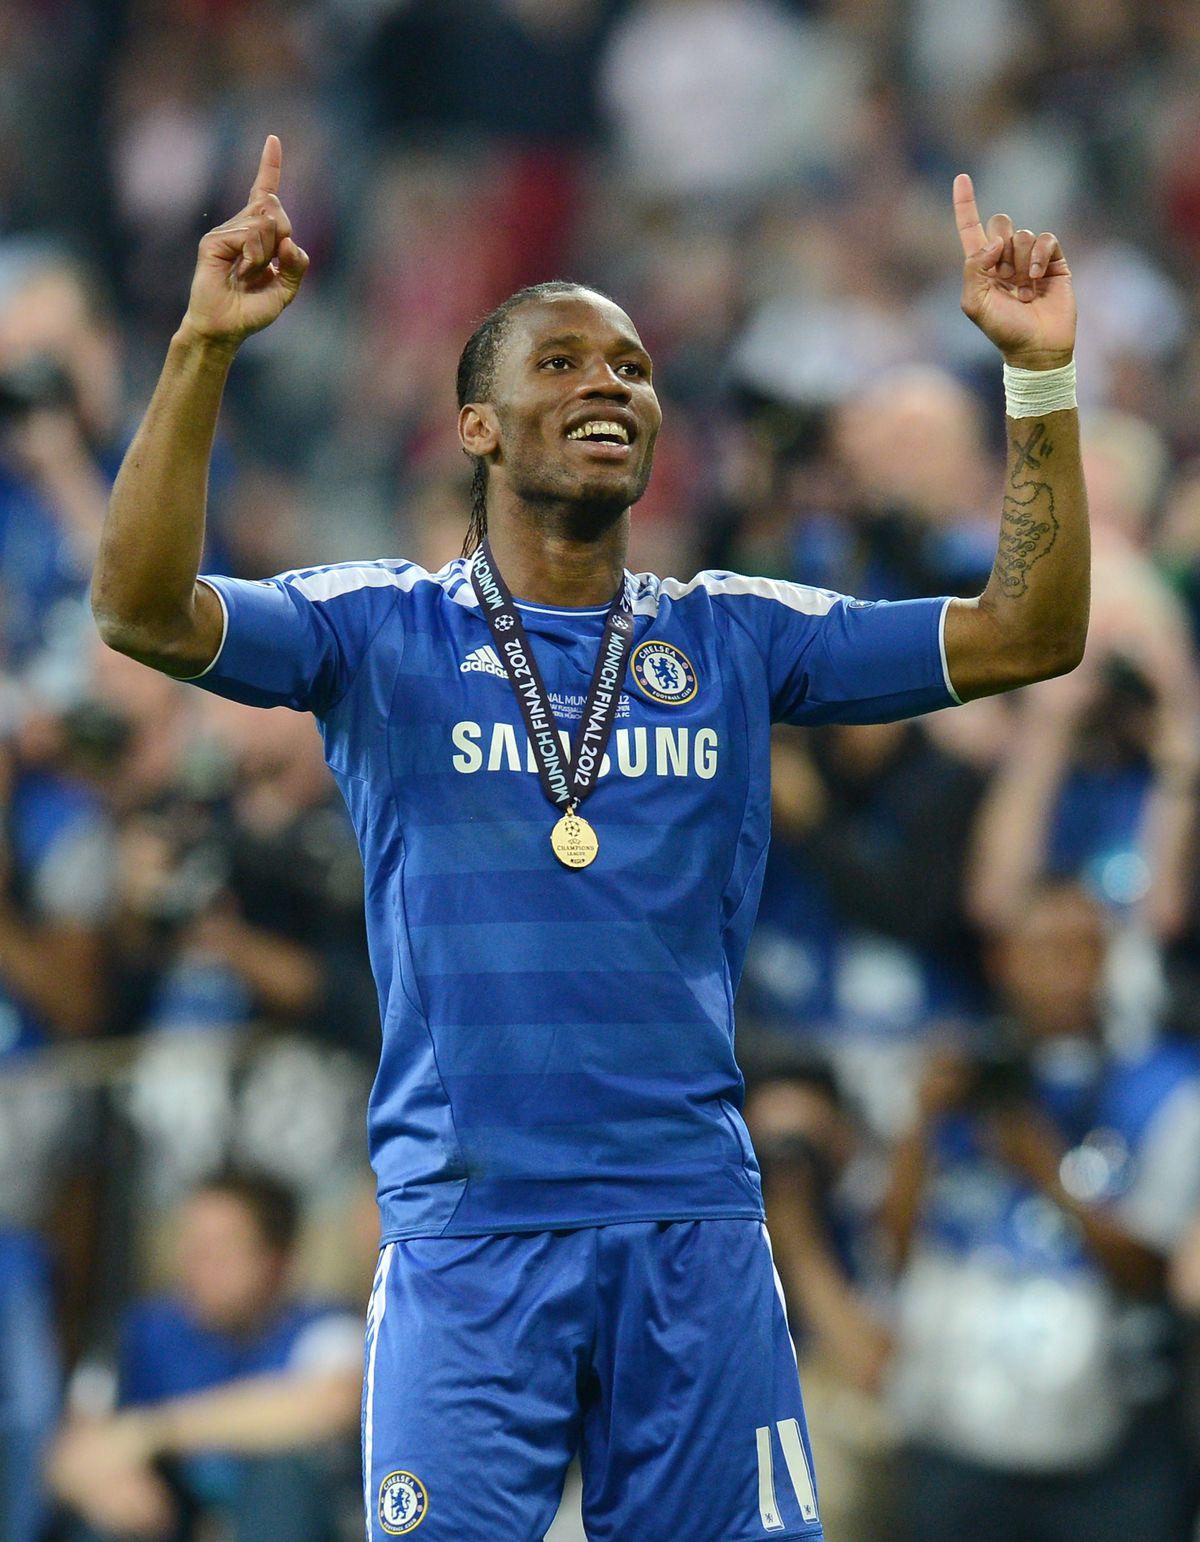 Champions League, Bayern München - FC Chelsea 4:5 n.E.